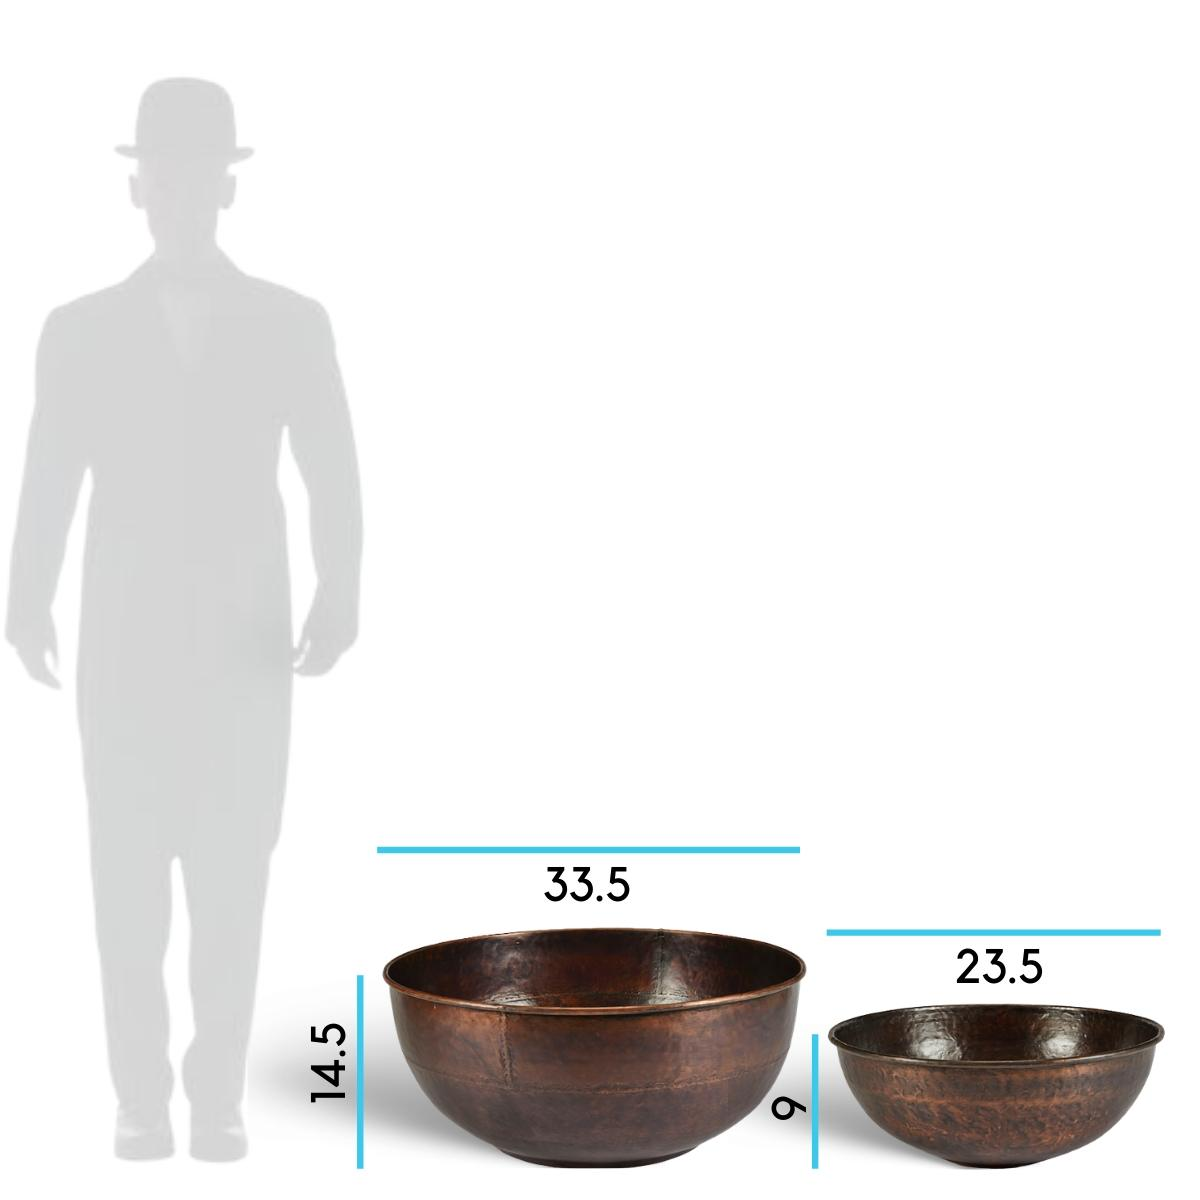 charleston-copper-bowl-planter-dimensions-sizes